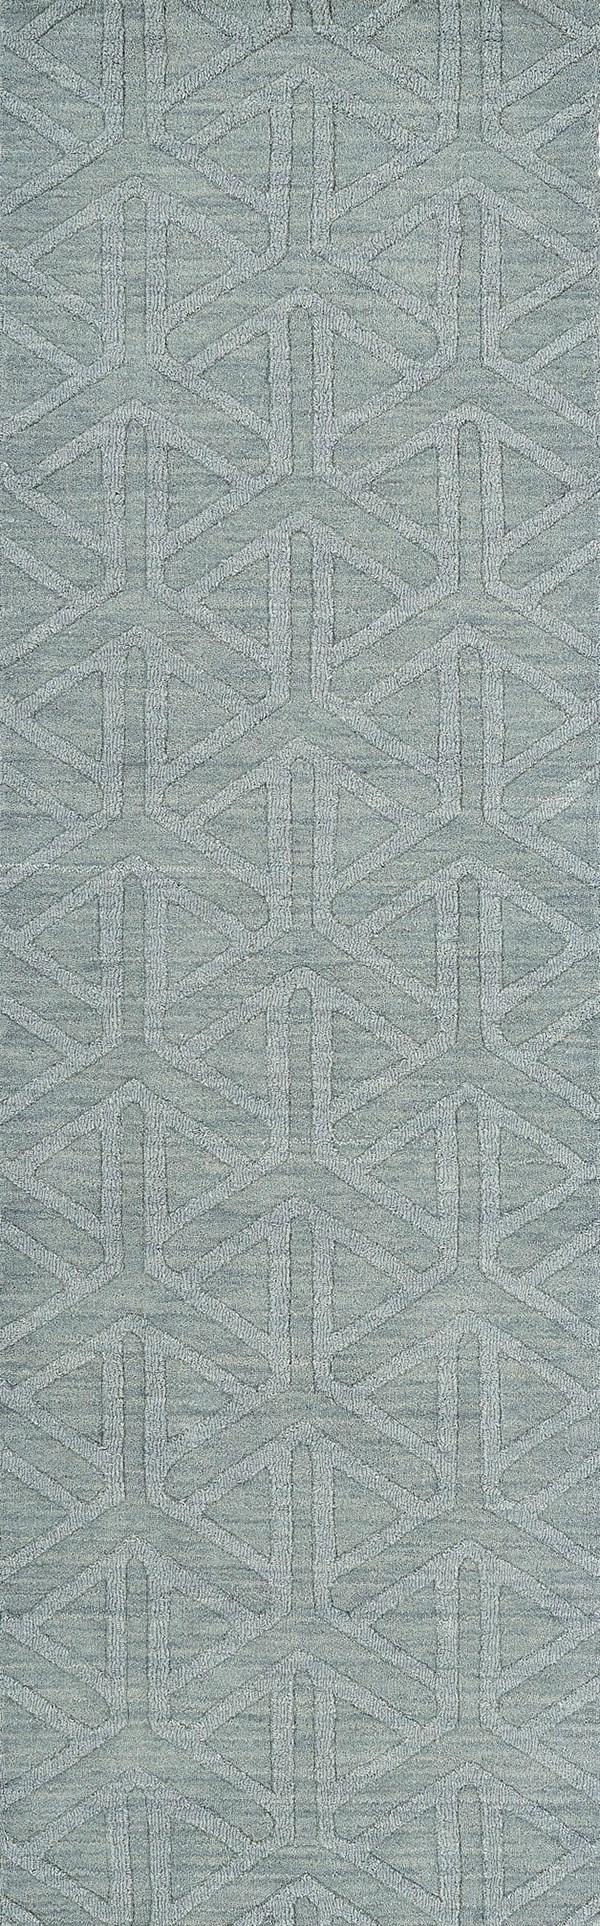 Light Blue (79) Textured Solid Area Rug